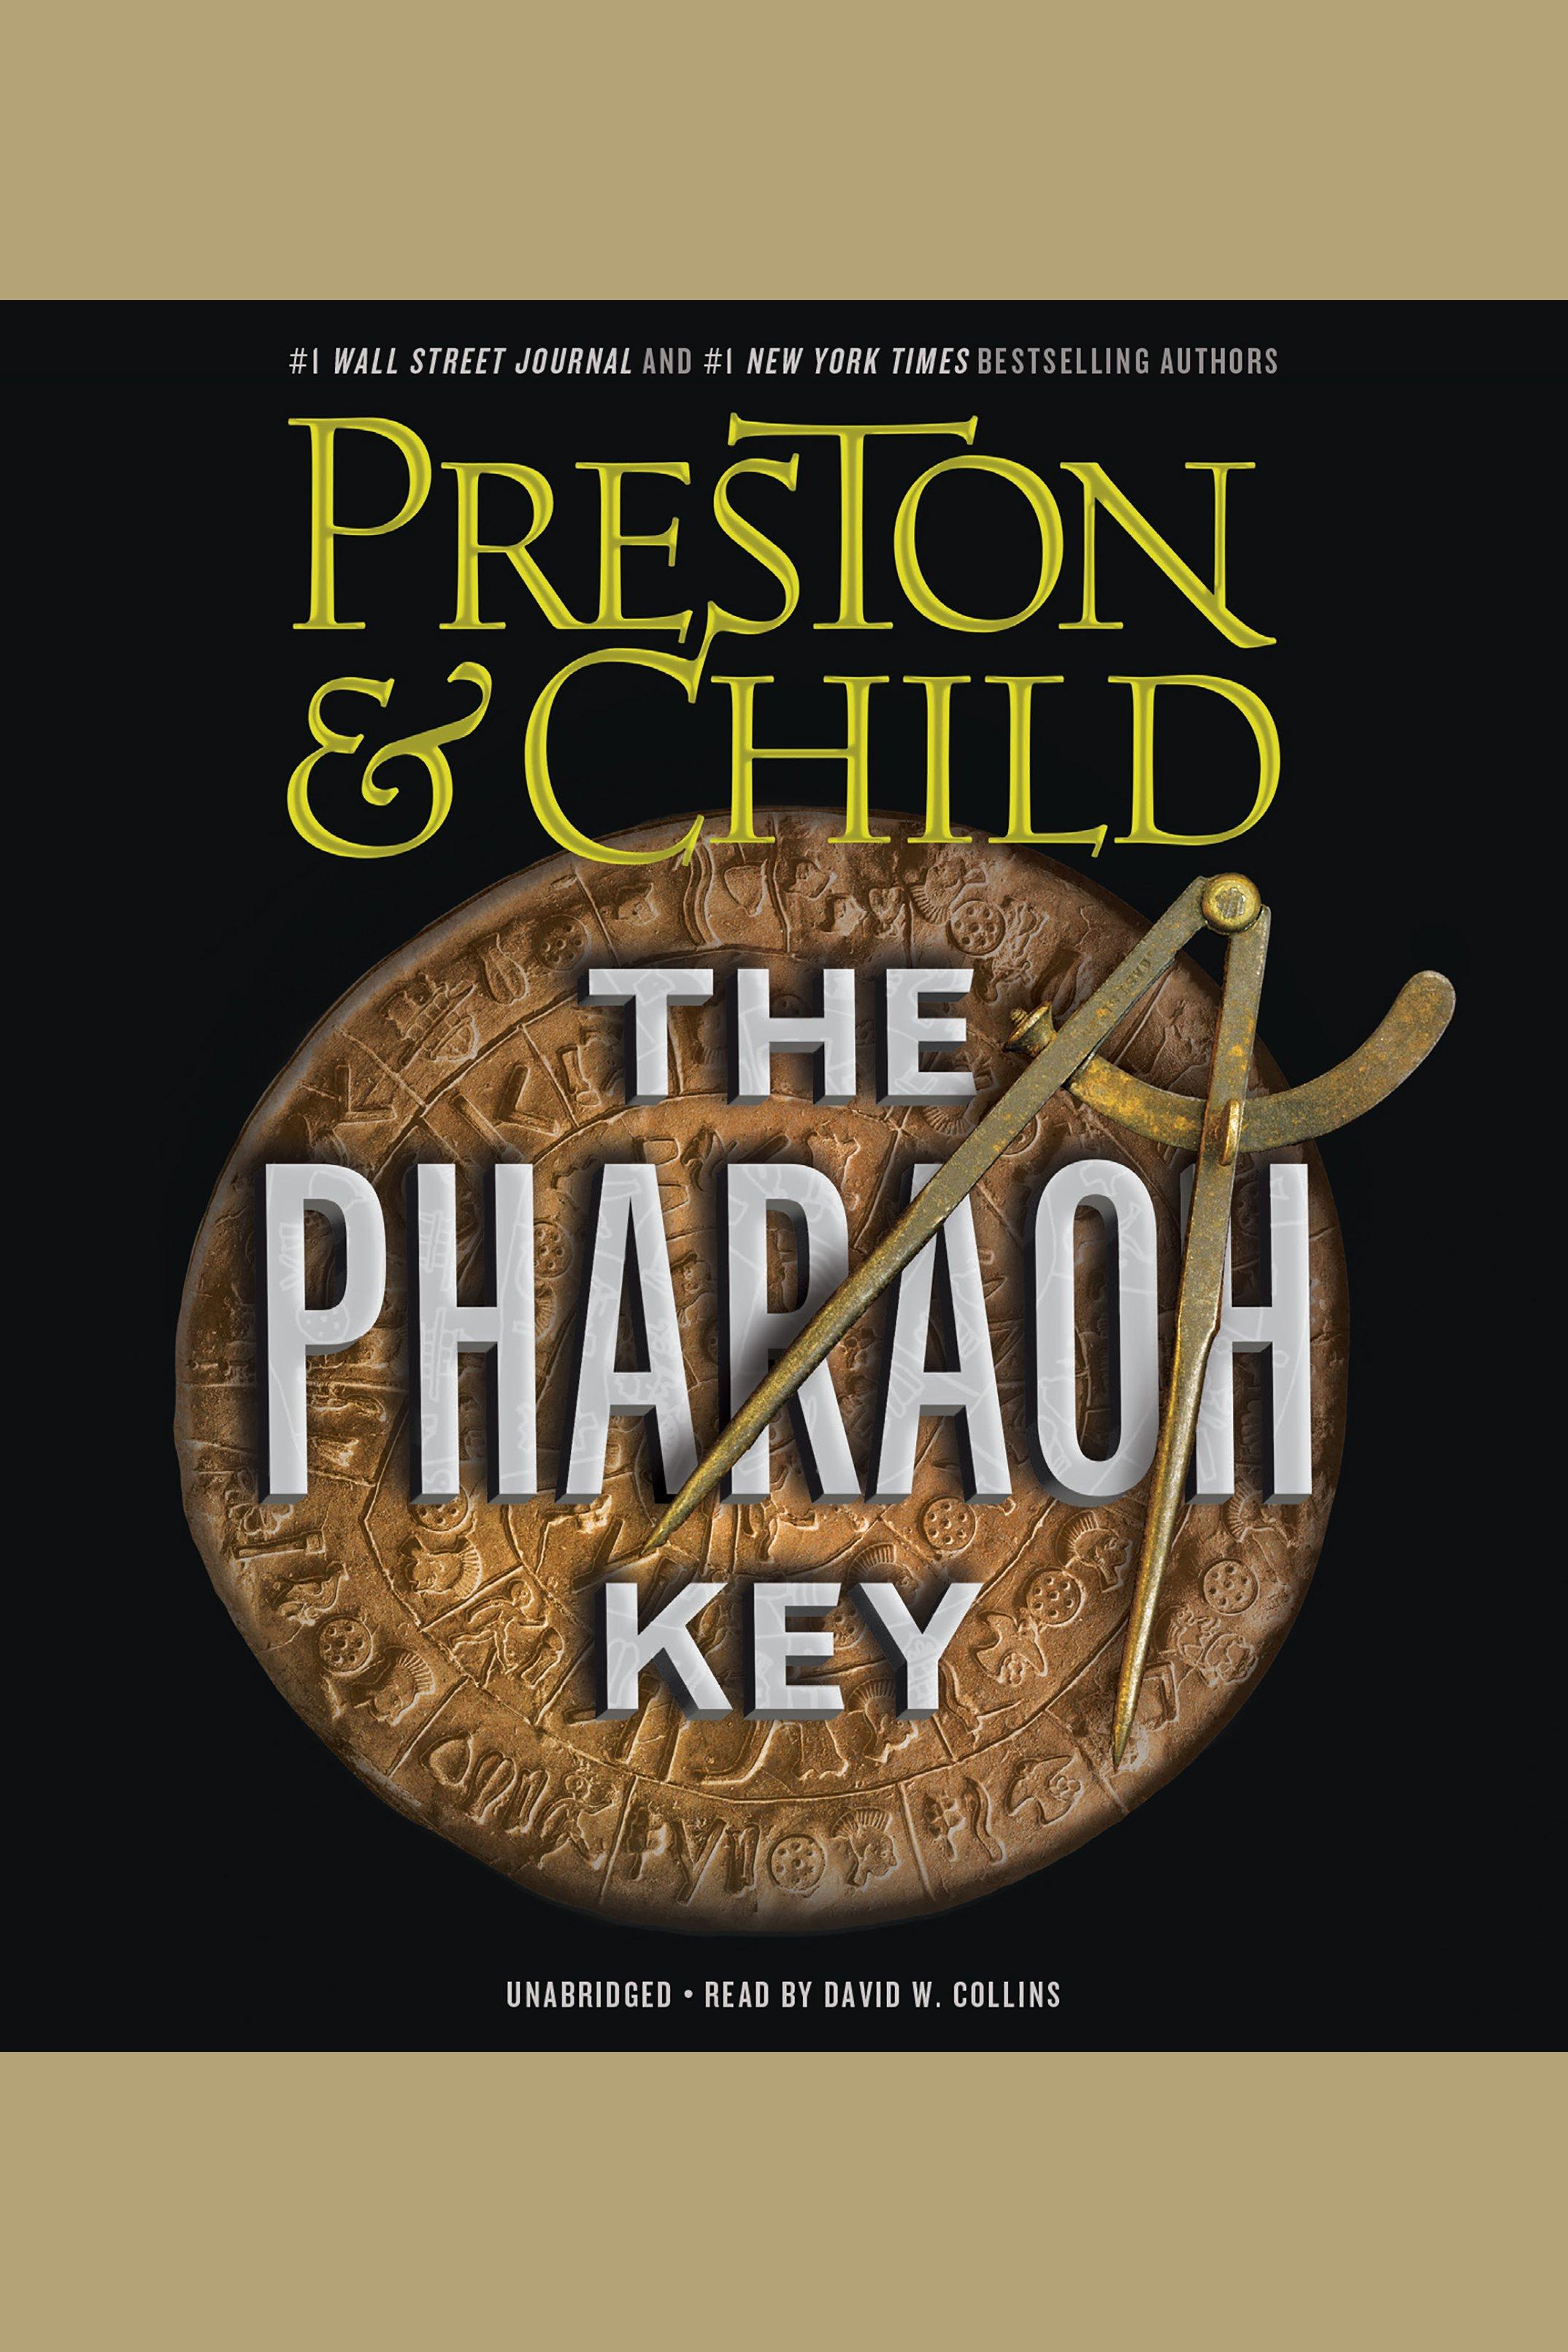 The pharaoh key cover image